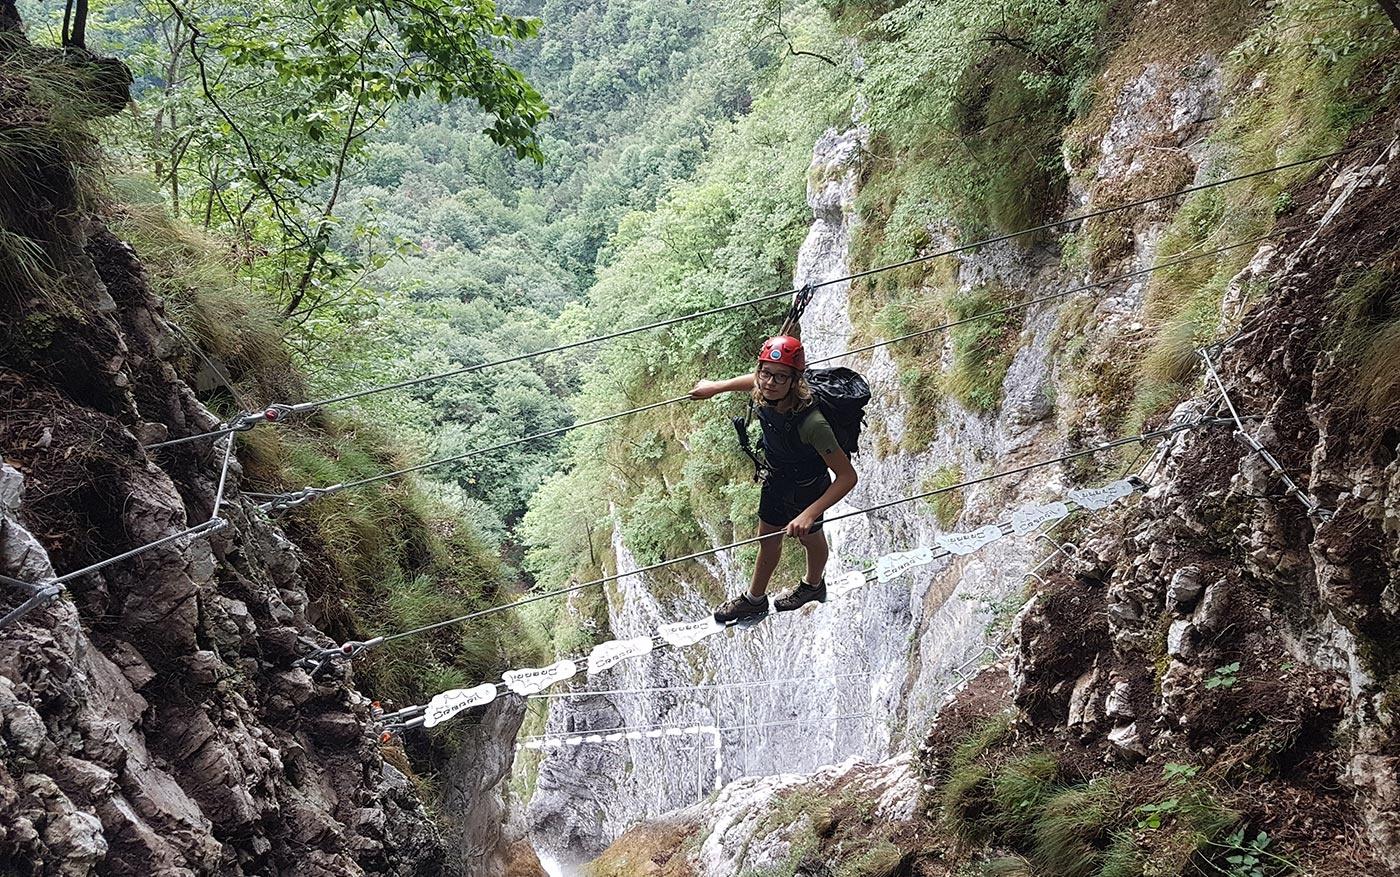 Ponte tibetano e cascata sulla Via ferrata Ballino